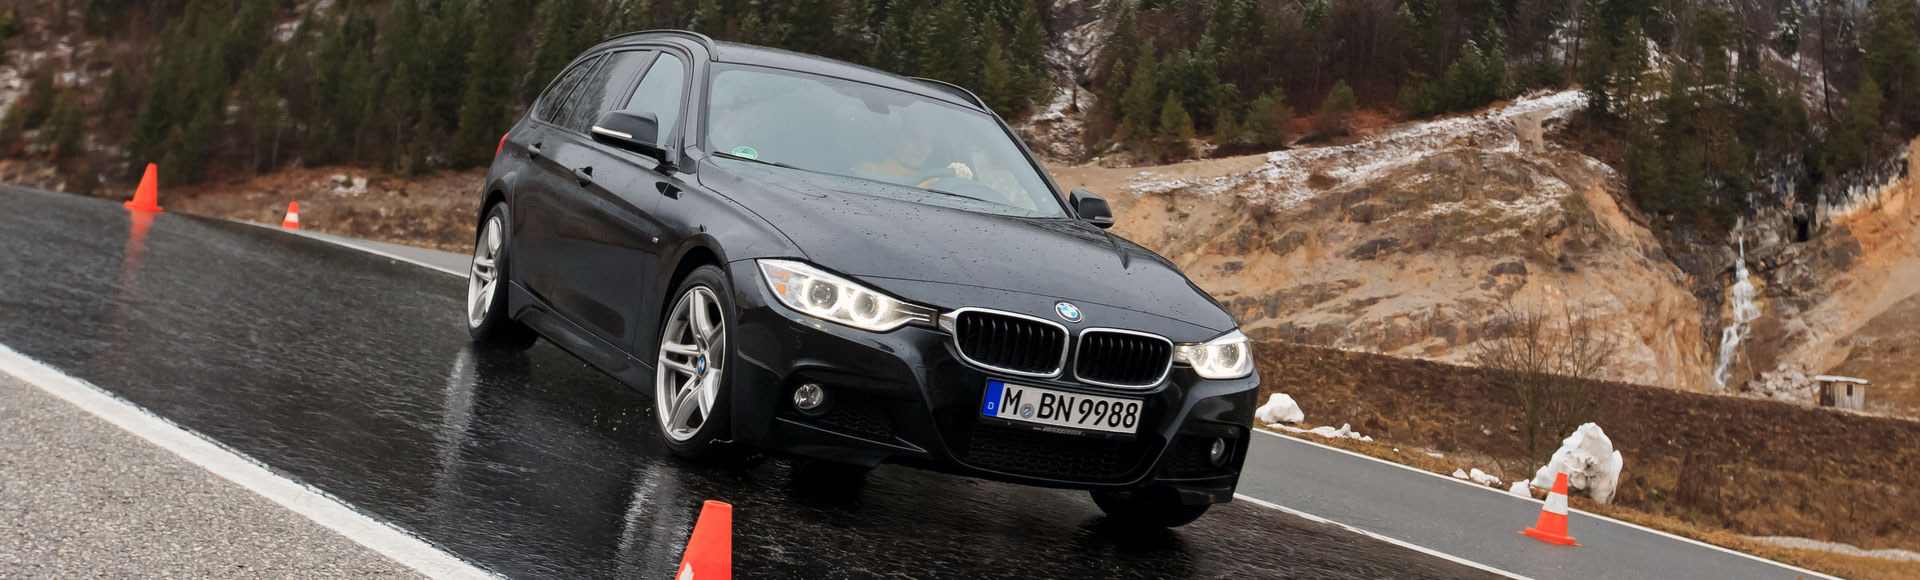 BMW 3er Touring 2013 Winter_X0772